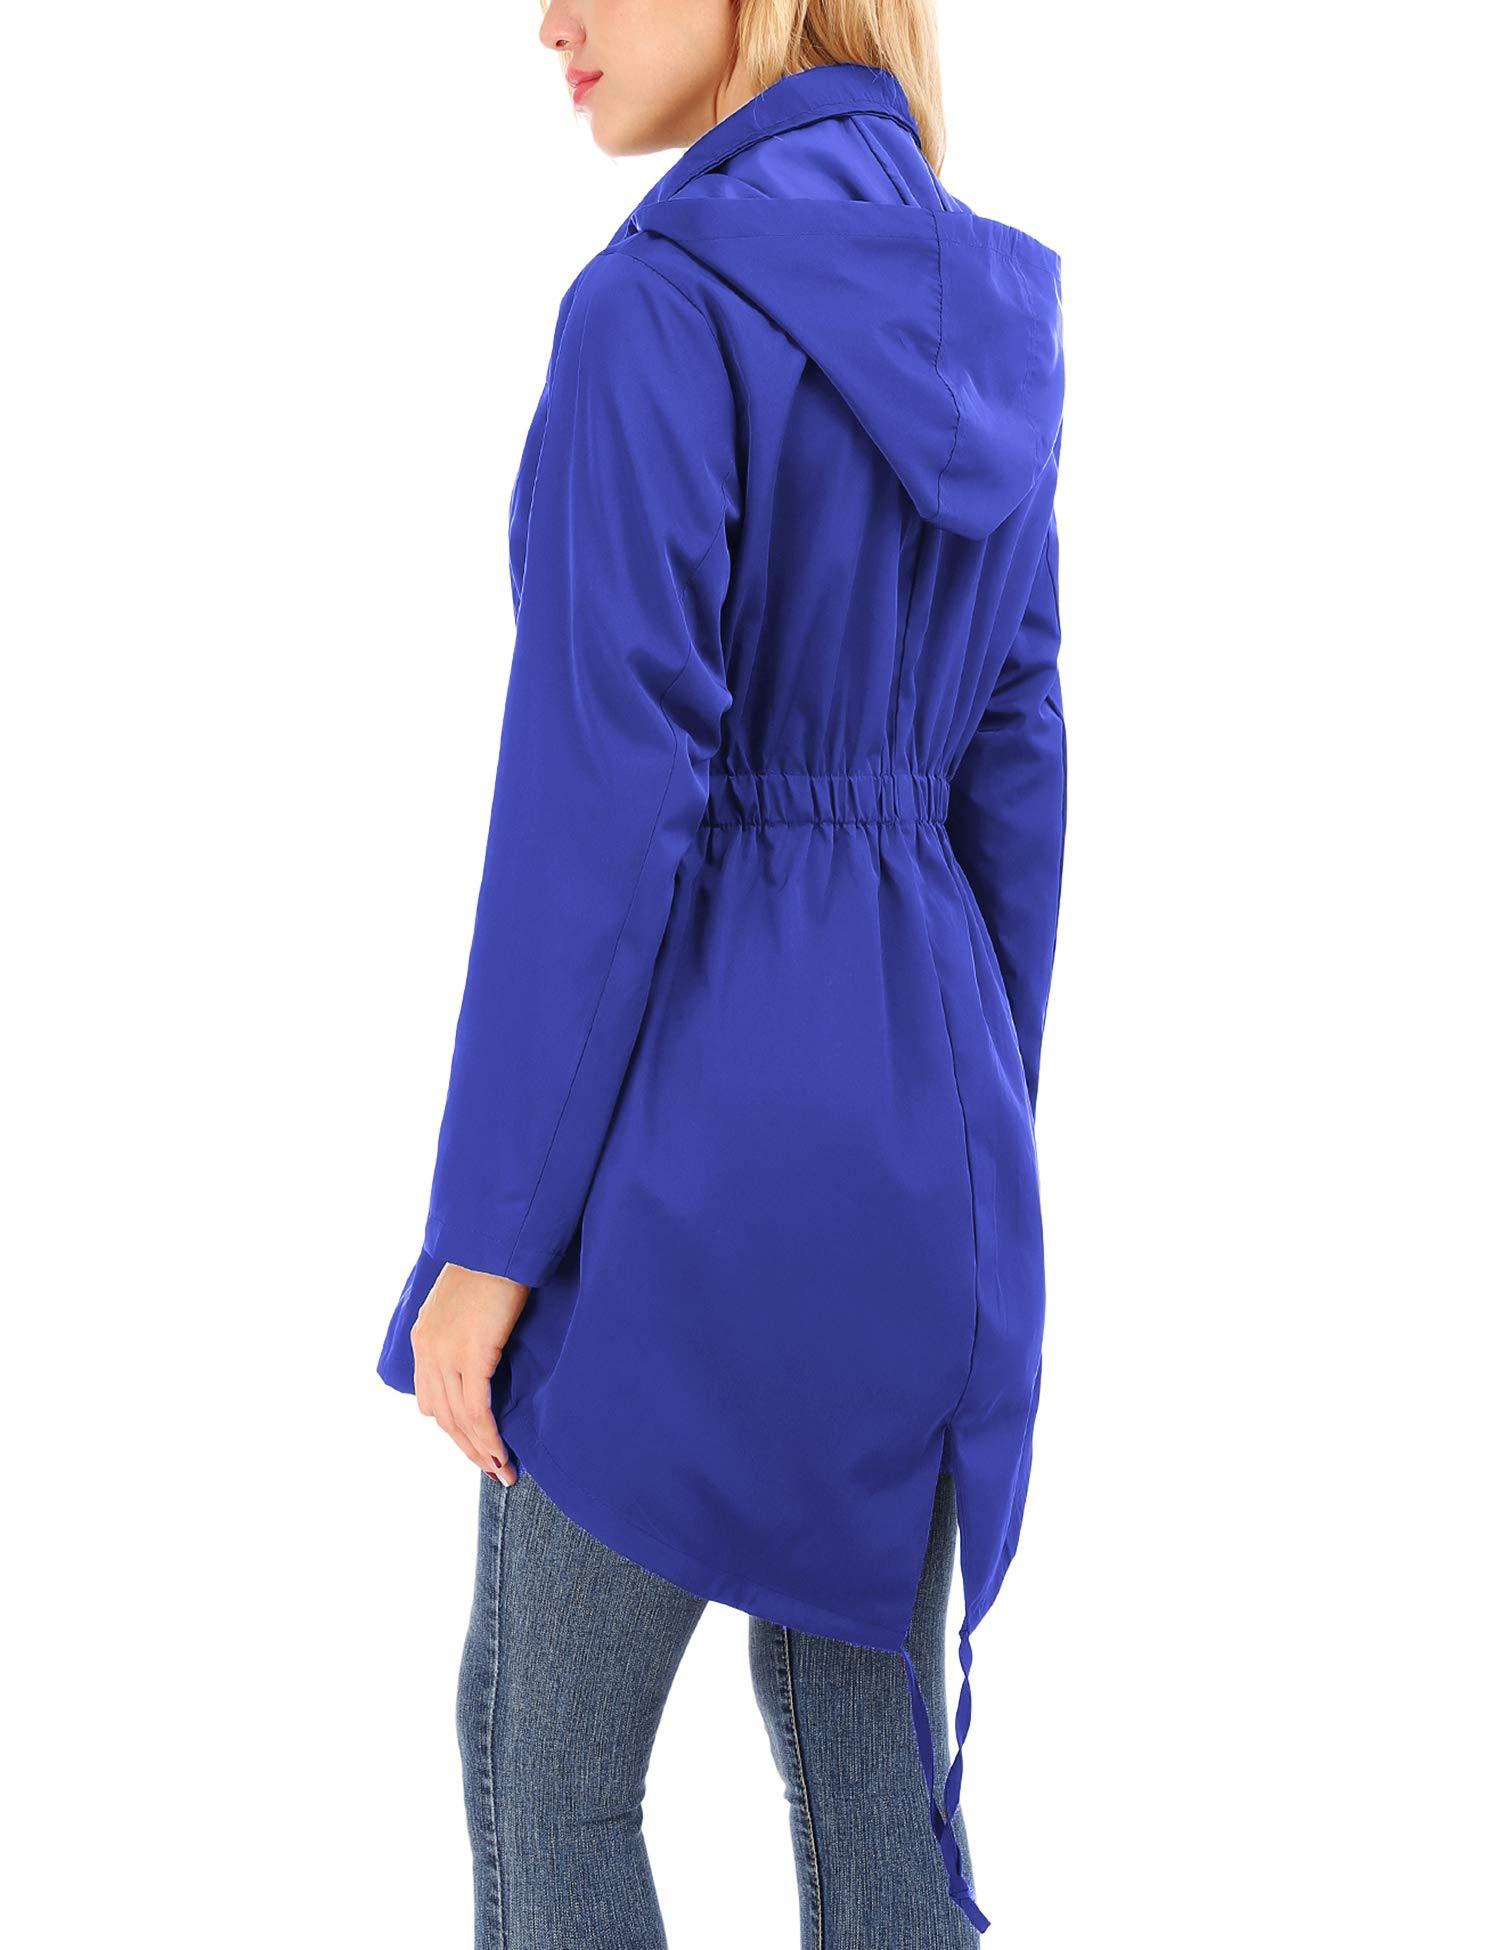 Uniboutique Raincoat Waterproof Outdoor Hooded Lightweight Rain Jacket Windbreaker by Uniboutique (Image #5)